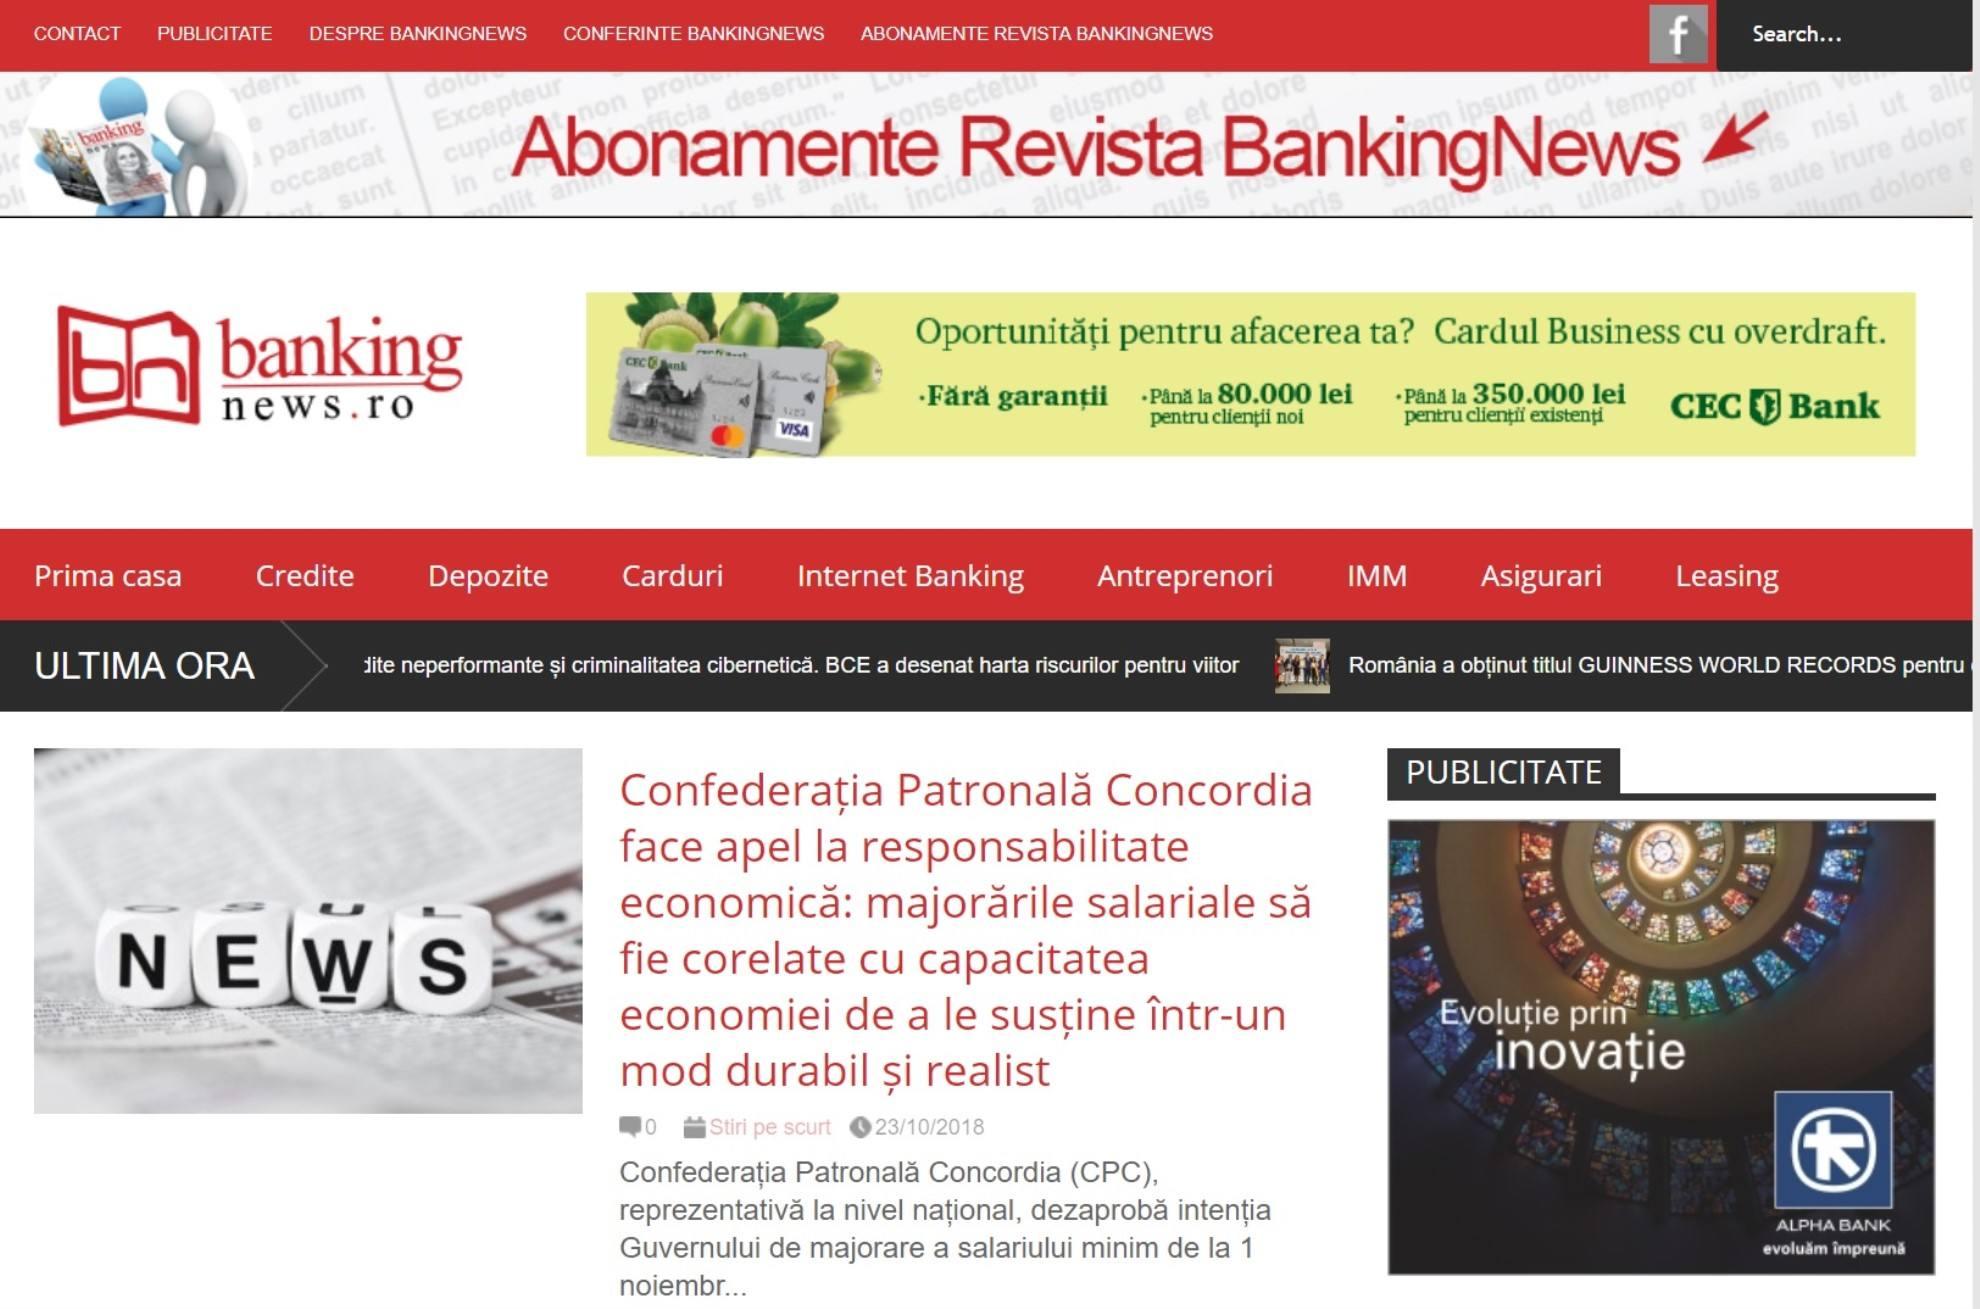 afaceri - Stiri Bancare